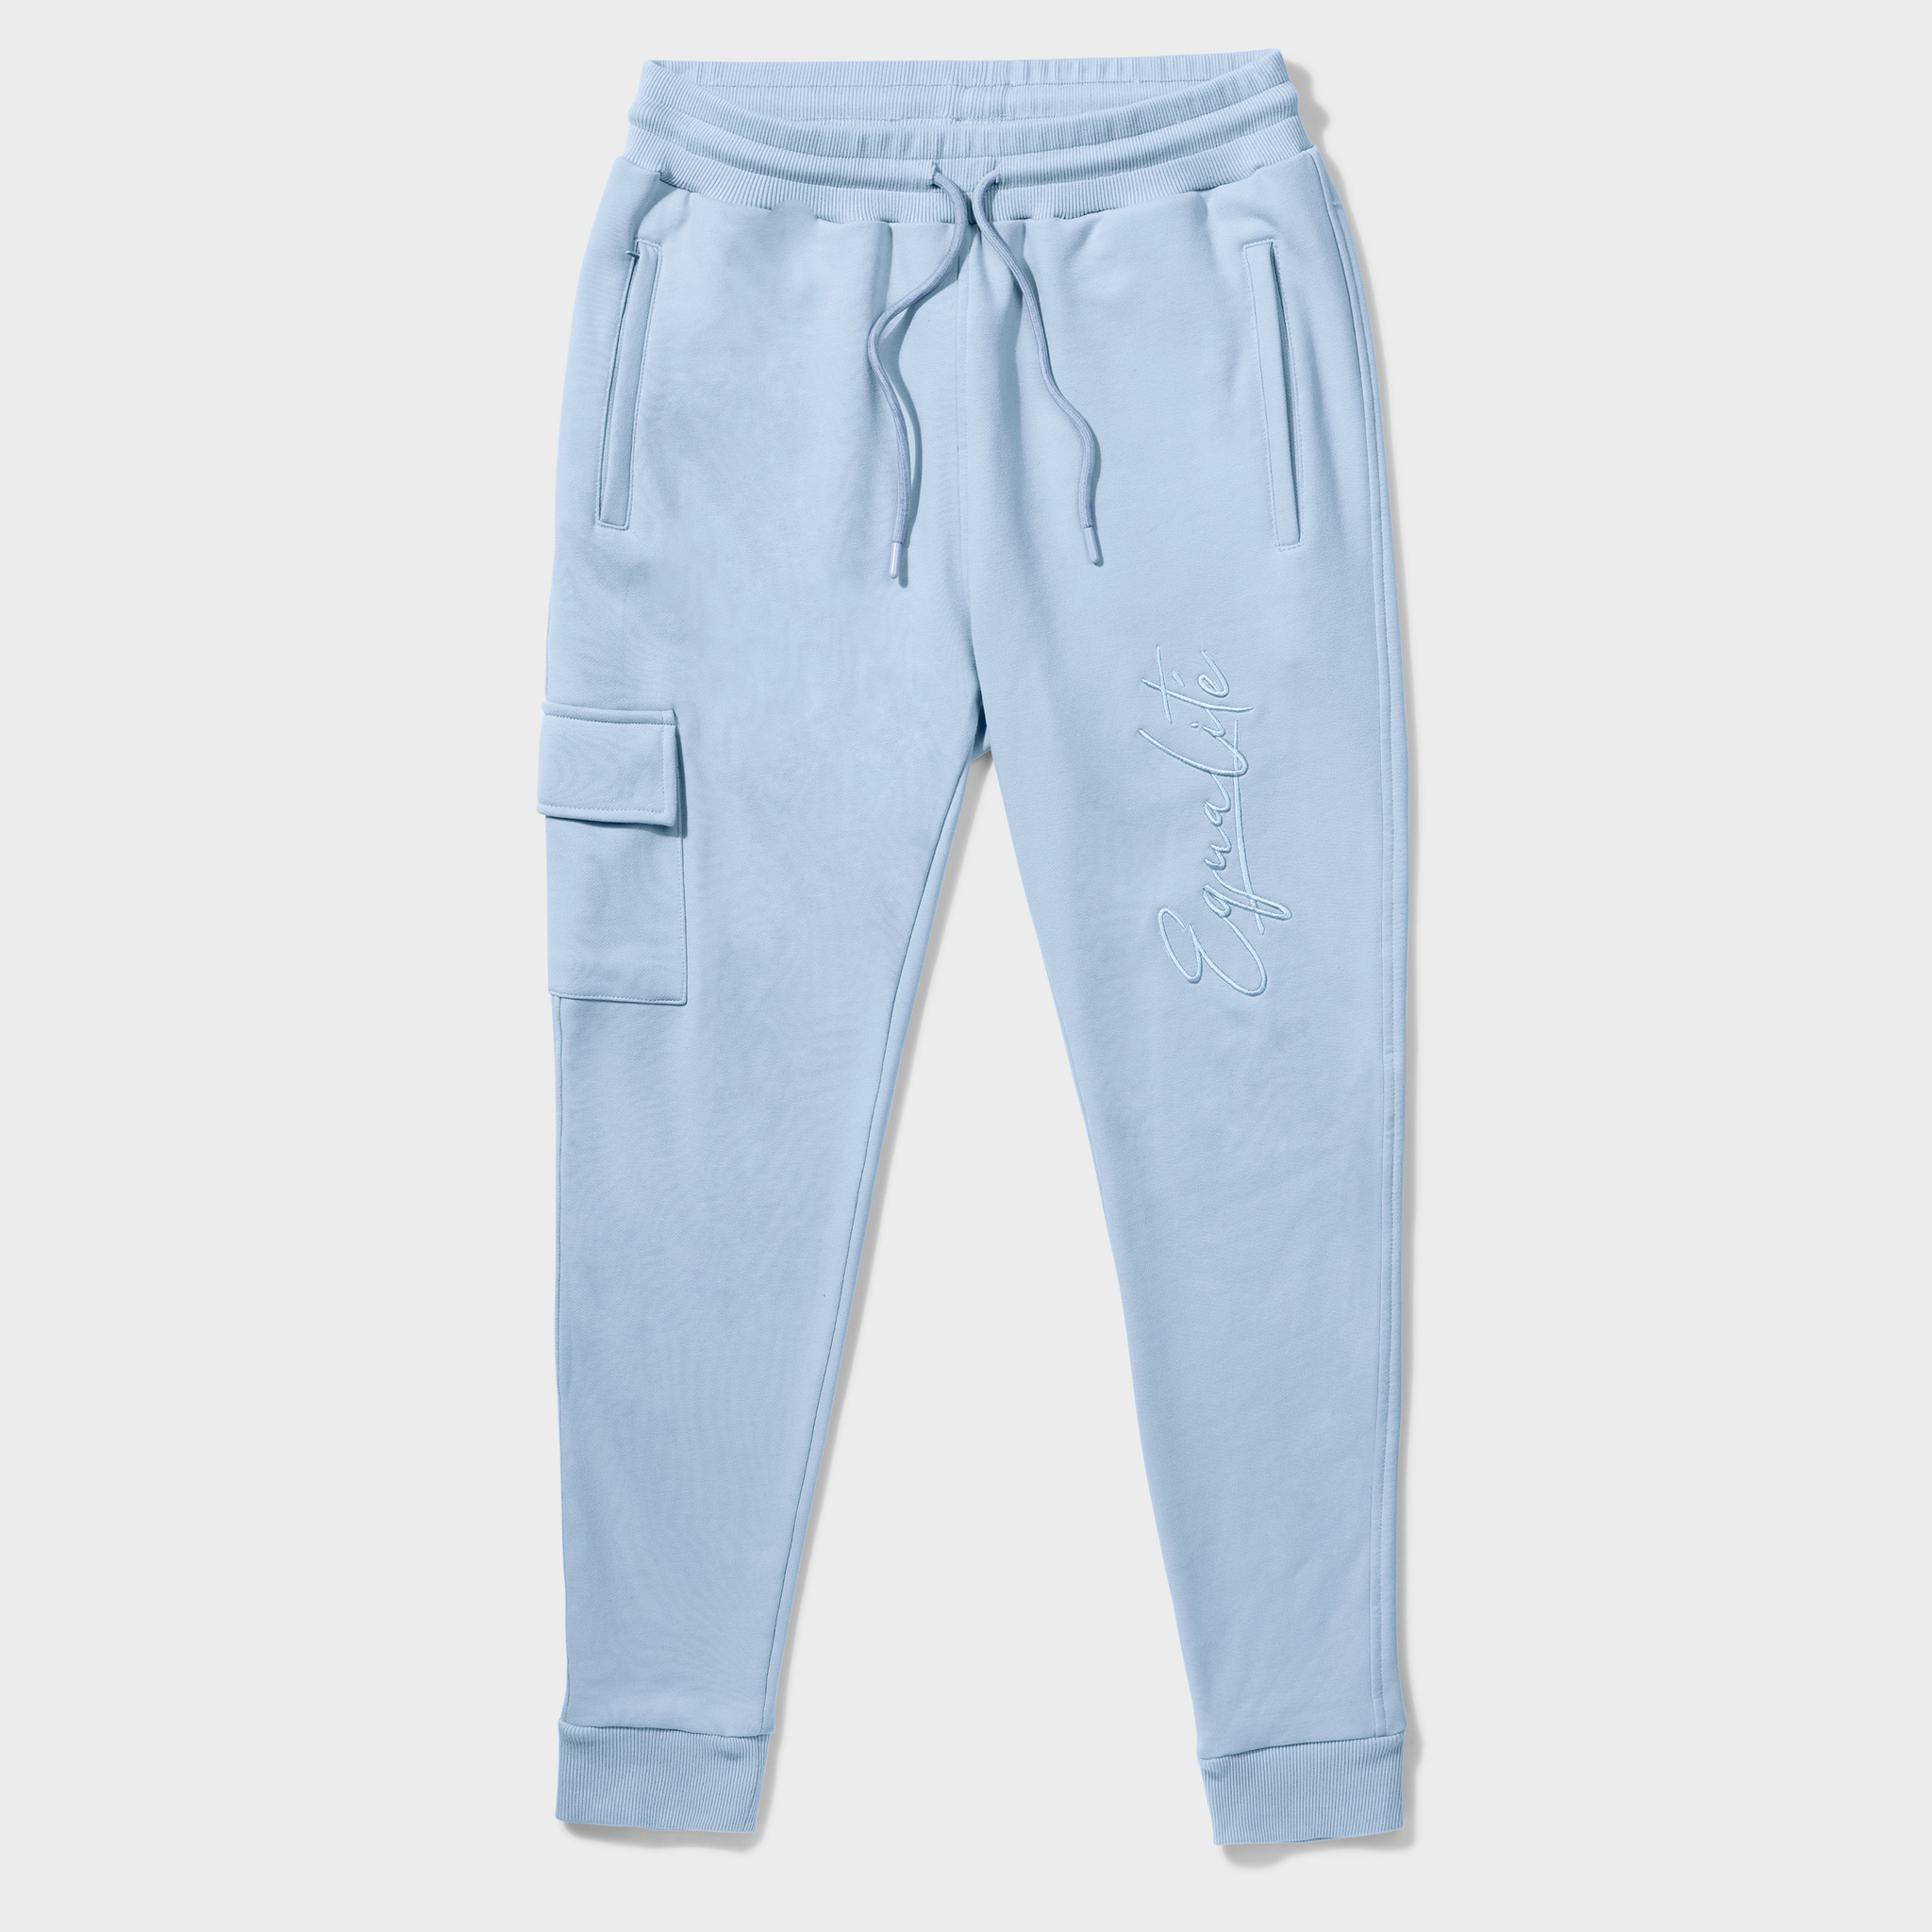 Wafi Signature Pants Light Blue-1